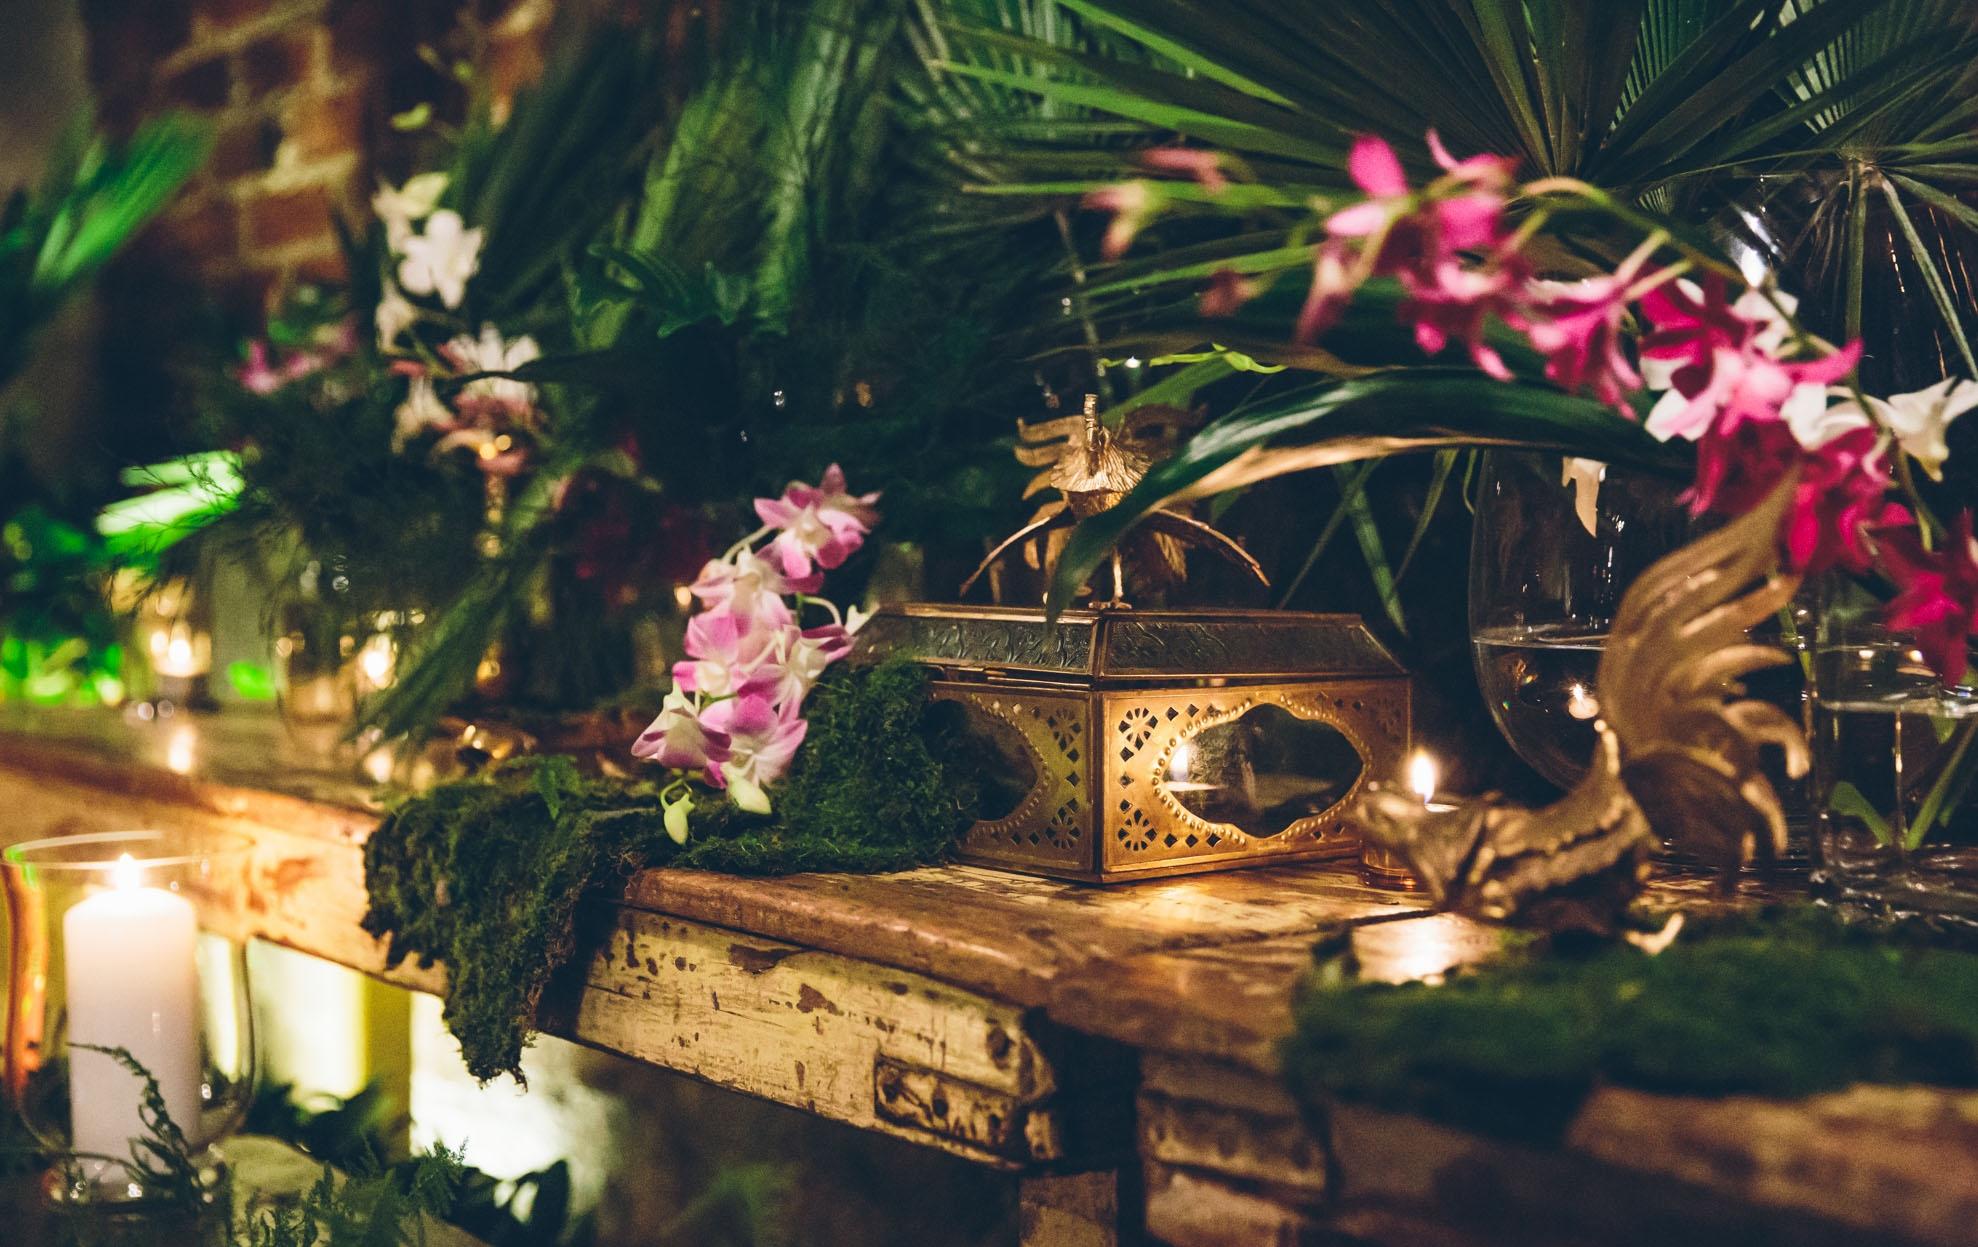 katy's-palace-johannesburg-wedding-shanna-jones-photography-kelly-costa-239.jpg